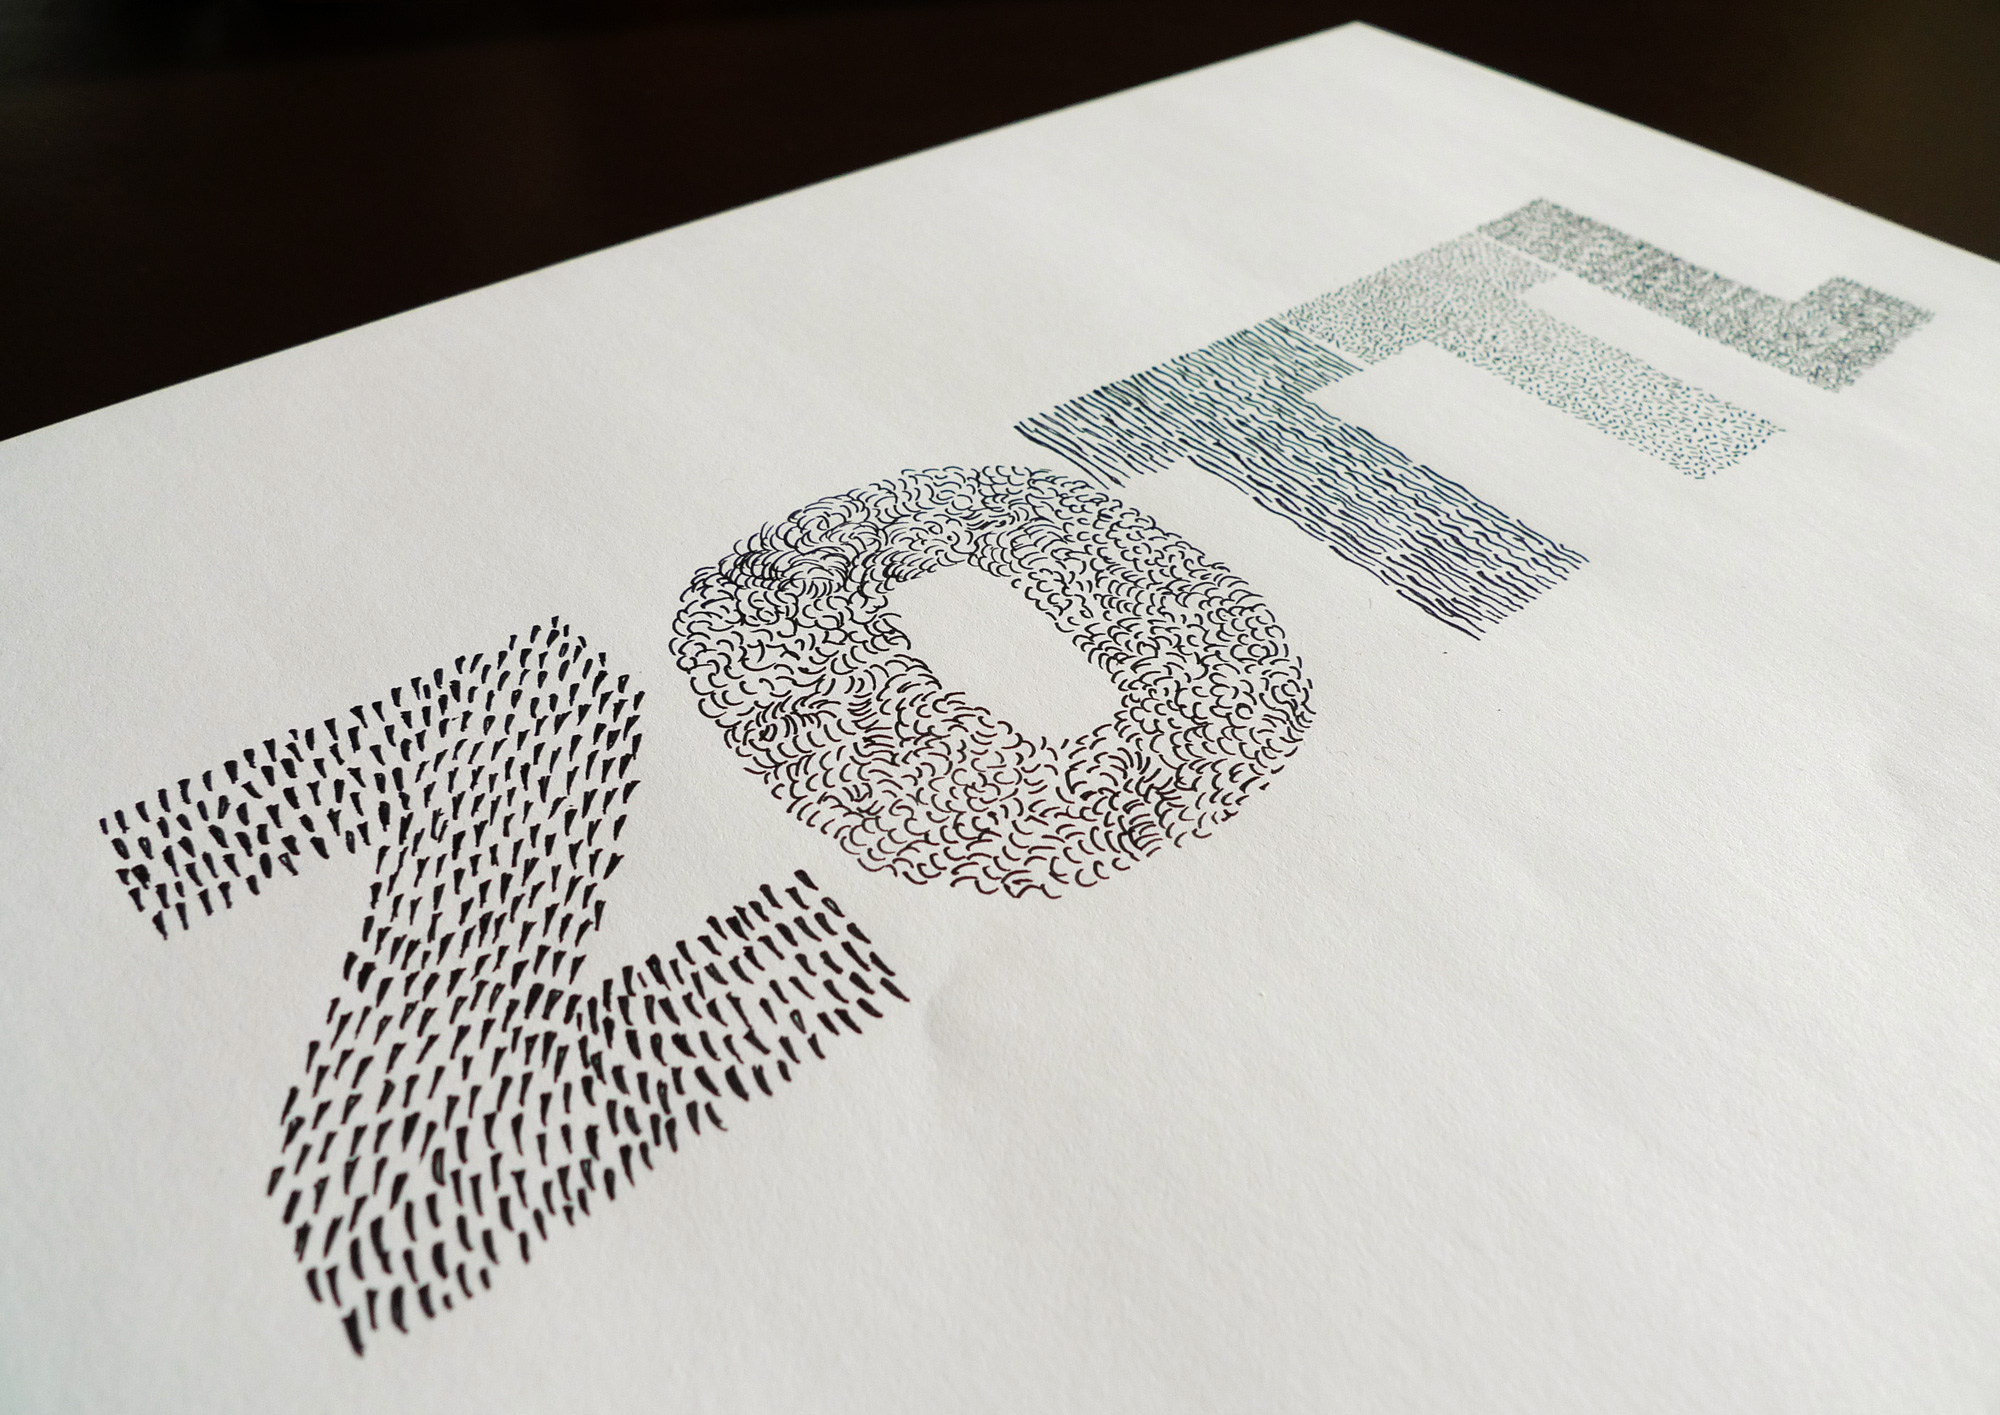 zottl-lettering-02